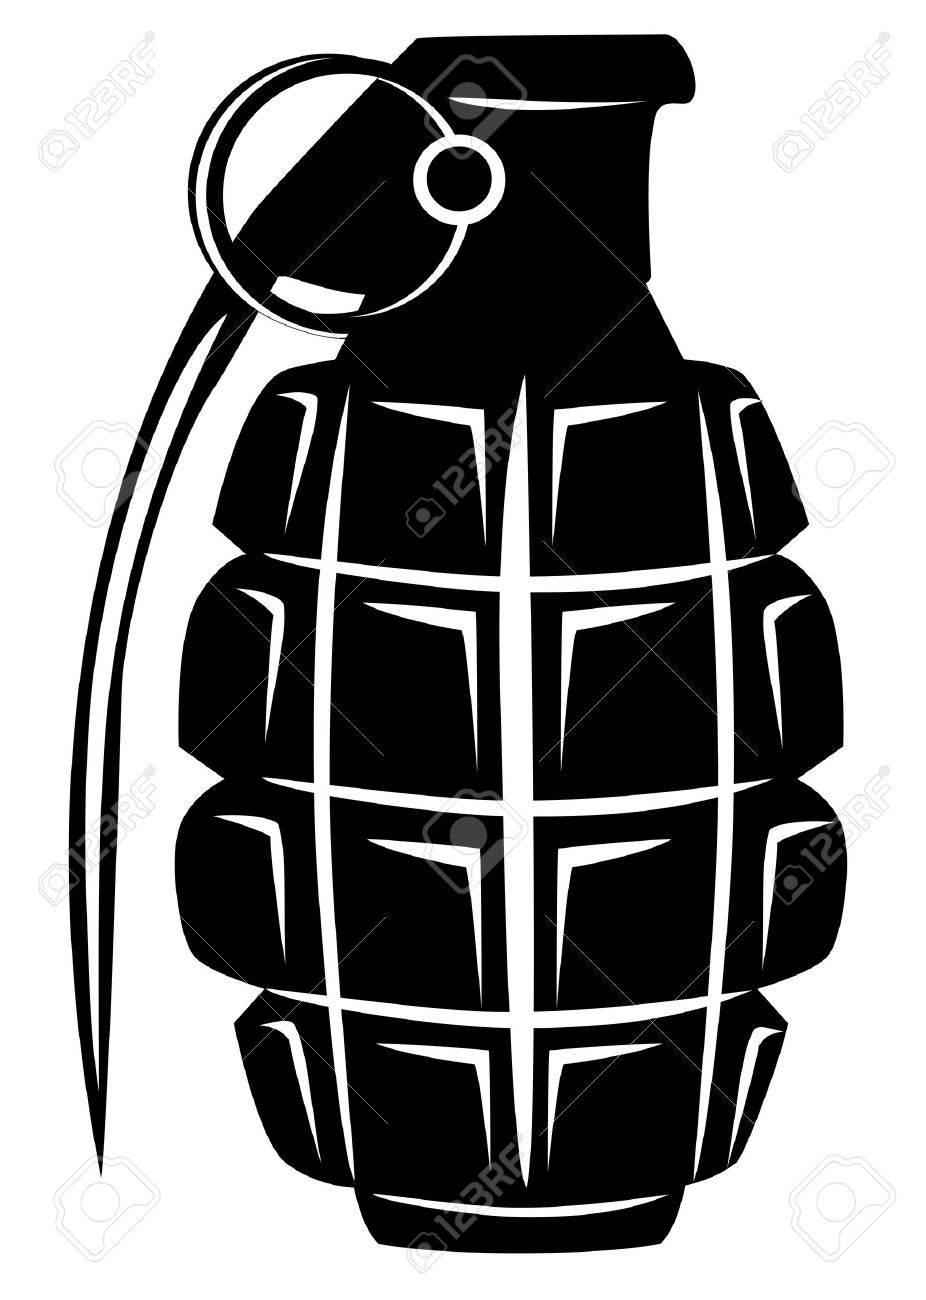 image of an army manual grenade royalty free cliparts vectors and rh 123rf com Grenade Graphics Bomb Vector